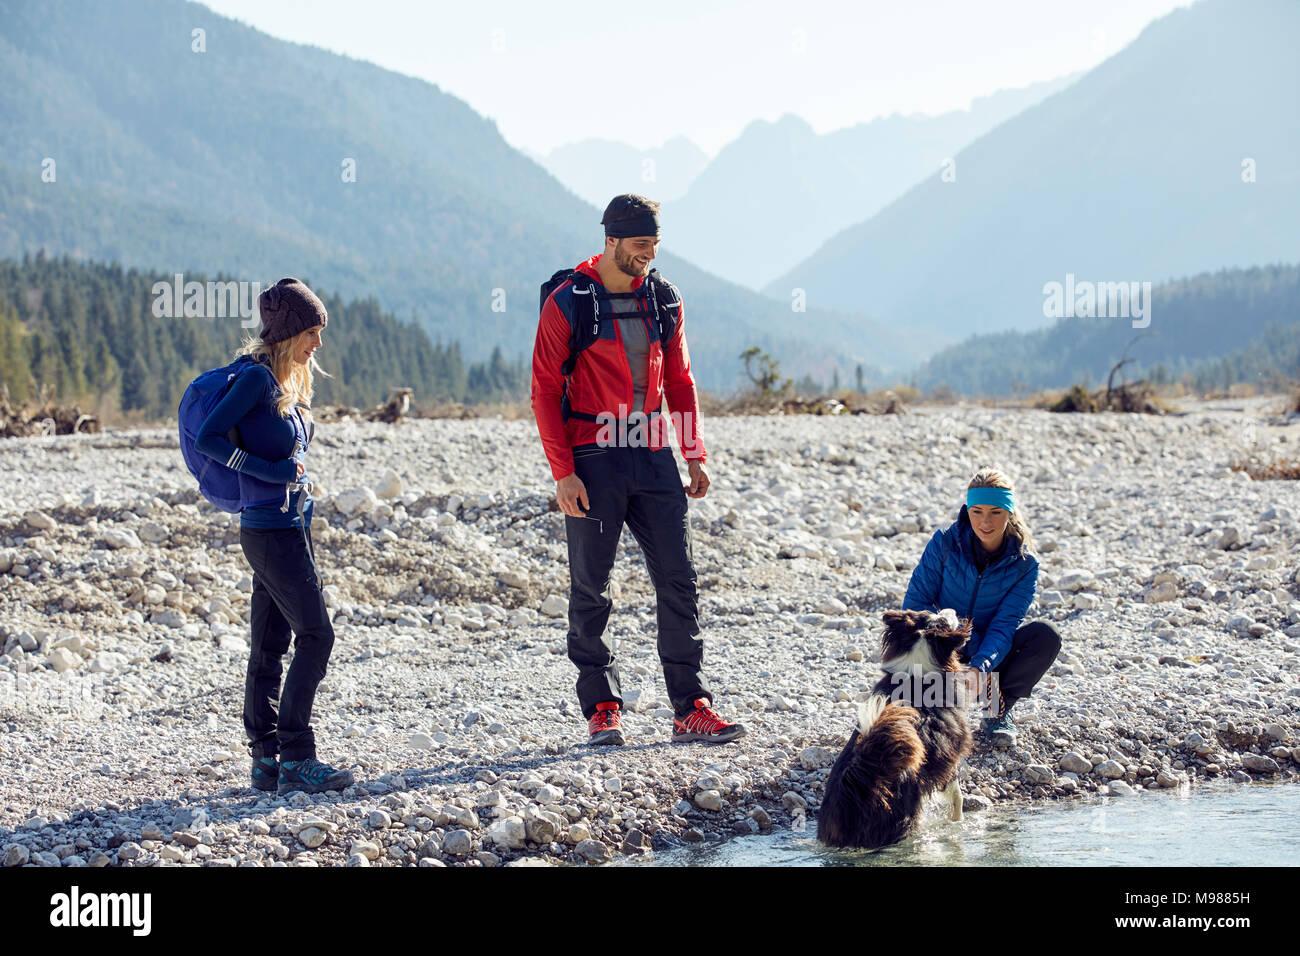 Germany, Bavaria, Karwendel, group of friends hiking with dog at the riverside - Stock Image